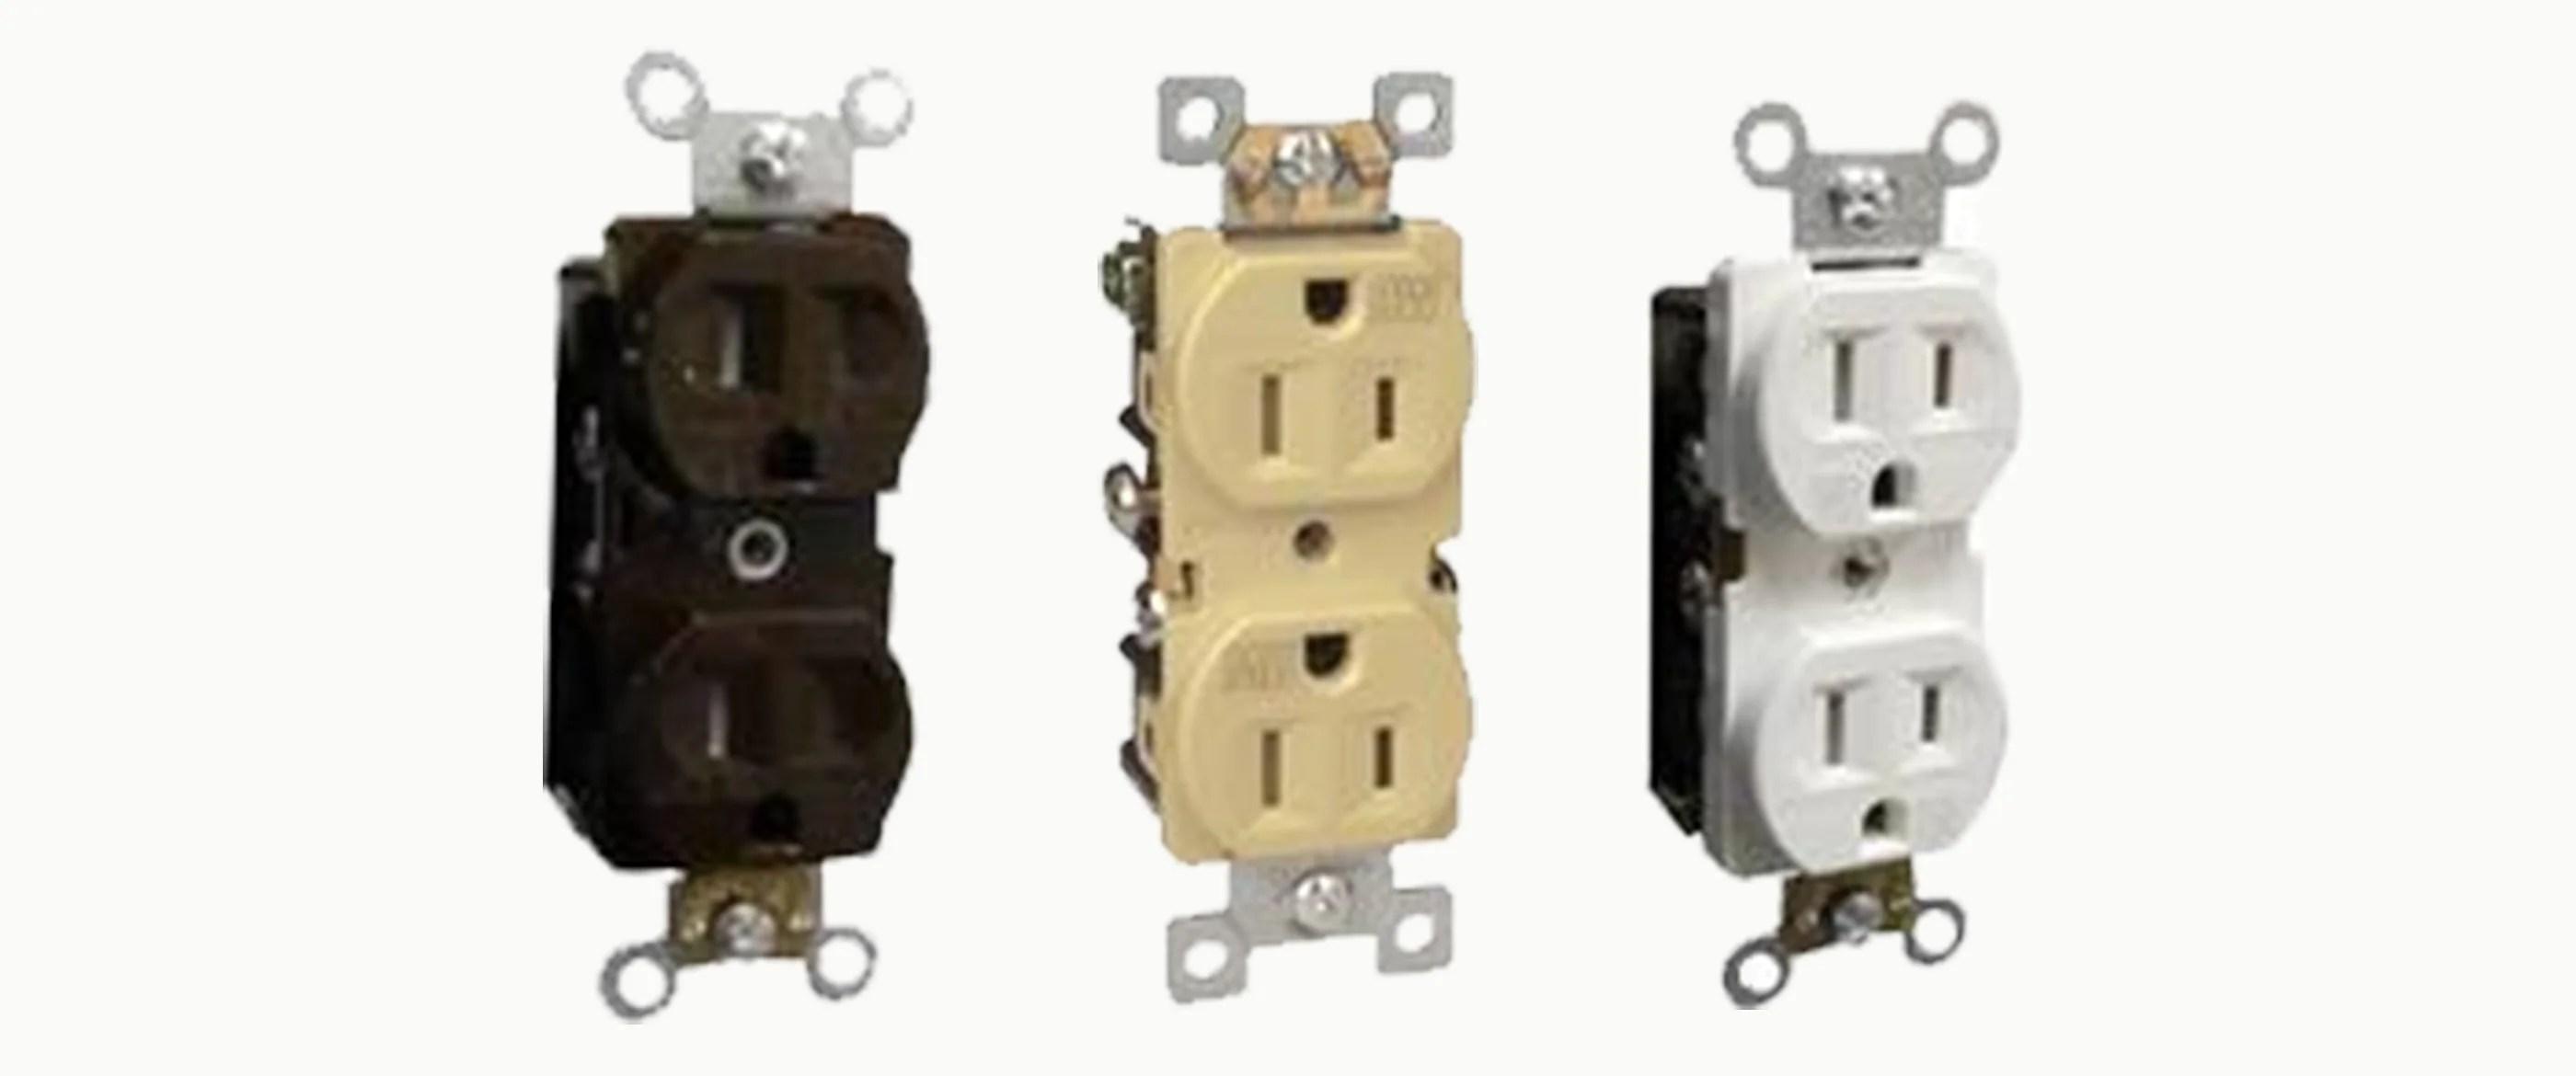 duplex wiring diagram for duplex receptacle on duplex switch receptacle ungrounded duplex with usb  [ 2800 x 1170 Pixel ]